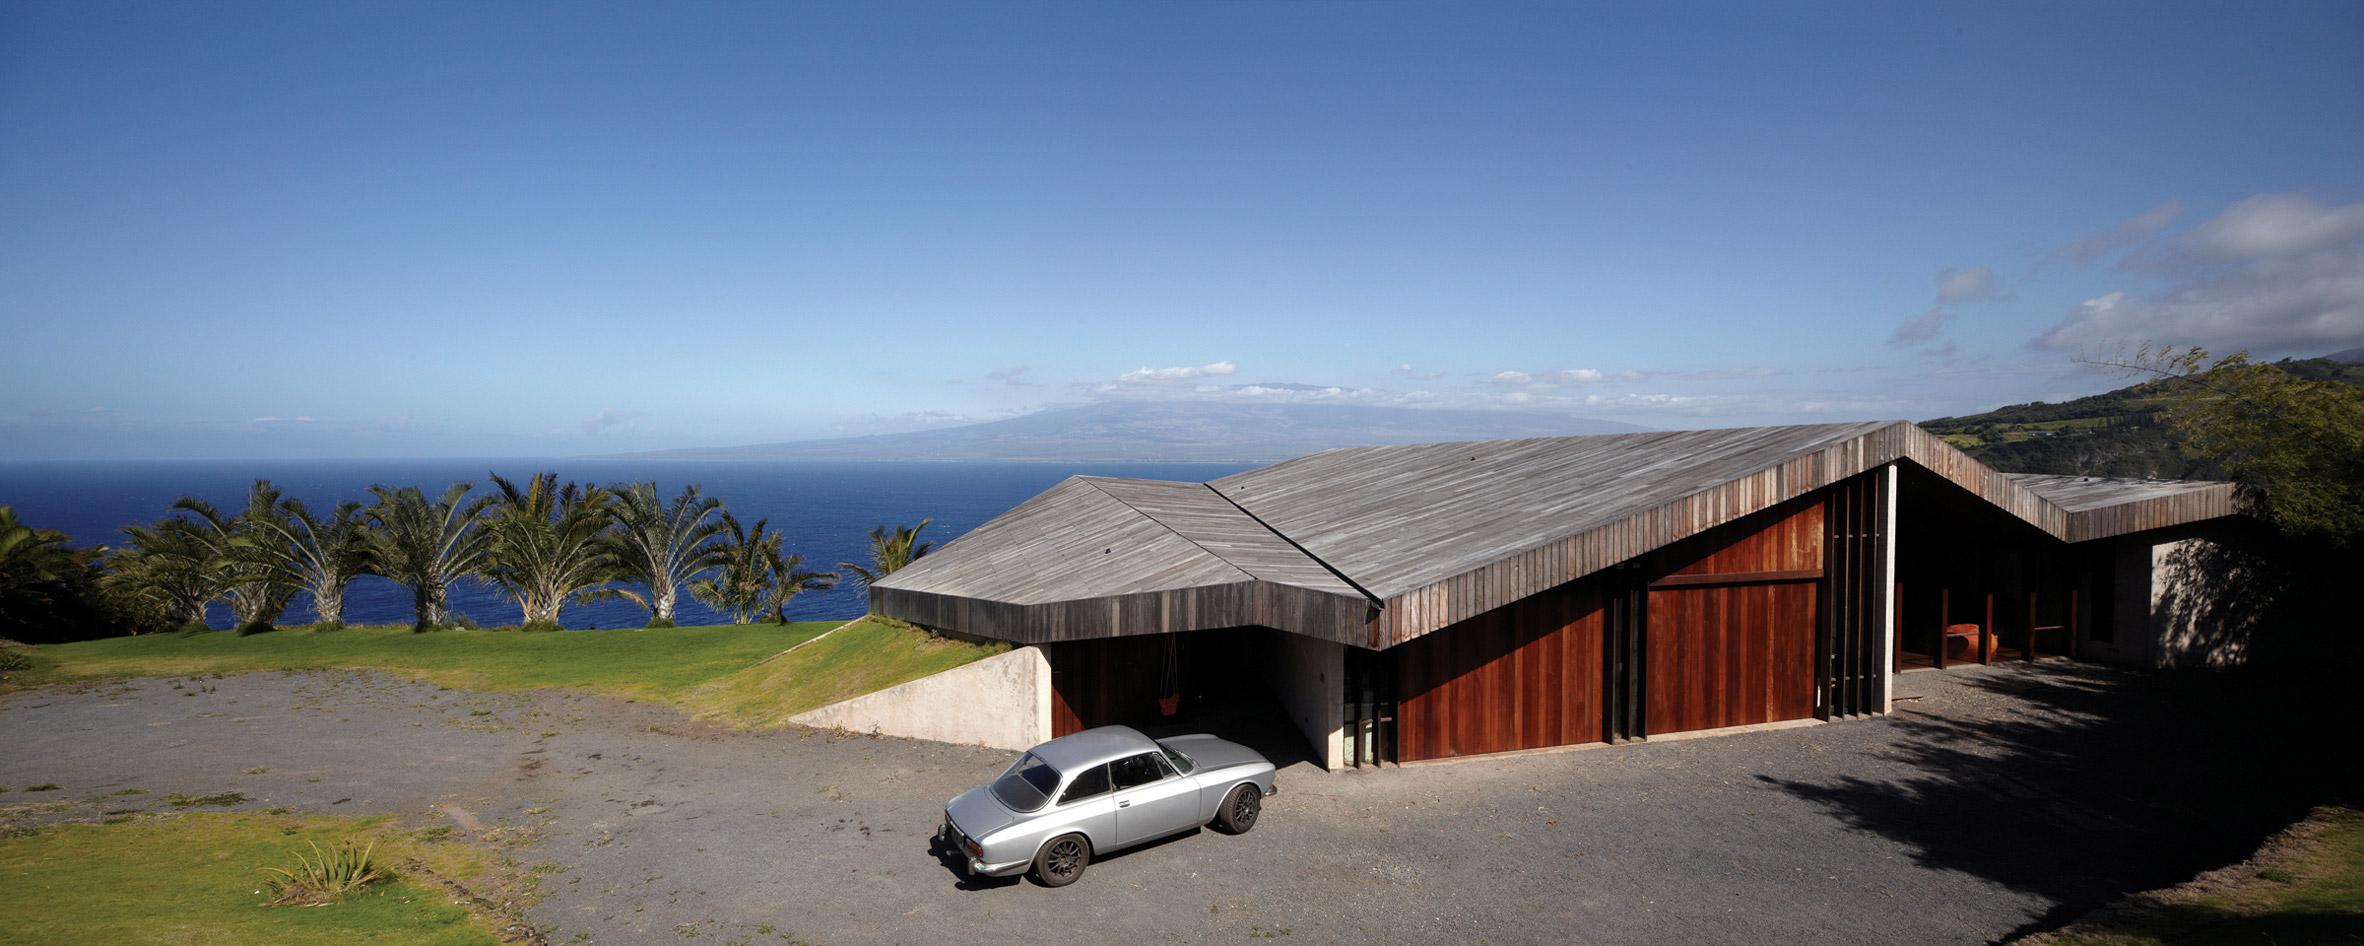 Angular roof covers clifftop home in Maui by Dekleva Gregorič Arhitekti